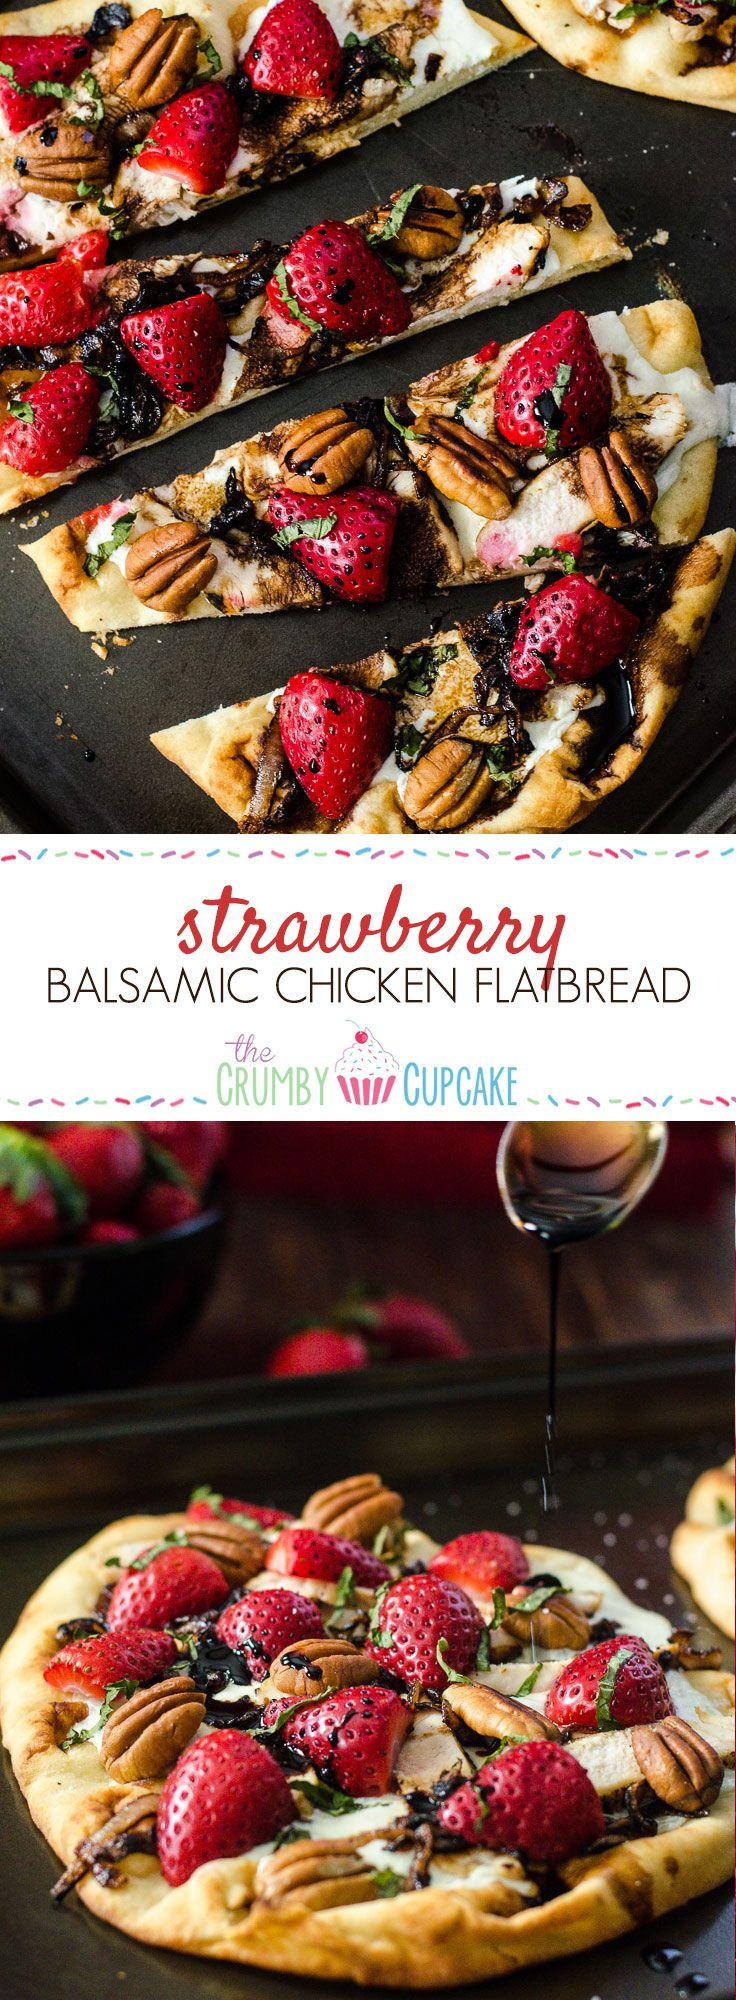 1000+ ideas about Chicken Flatbread on Pinterest ...